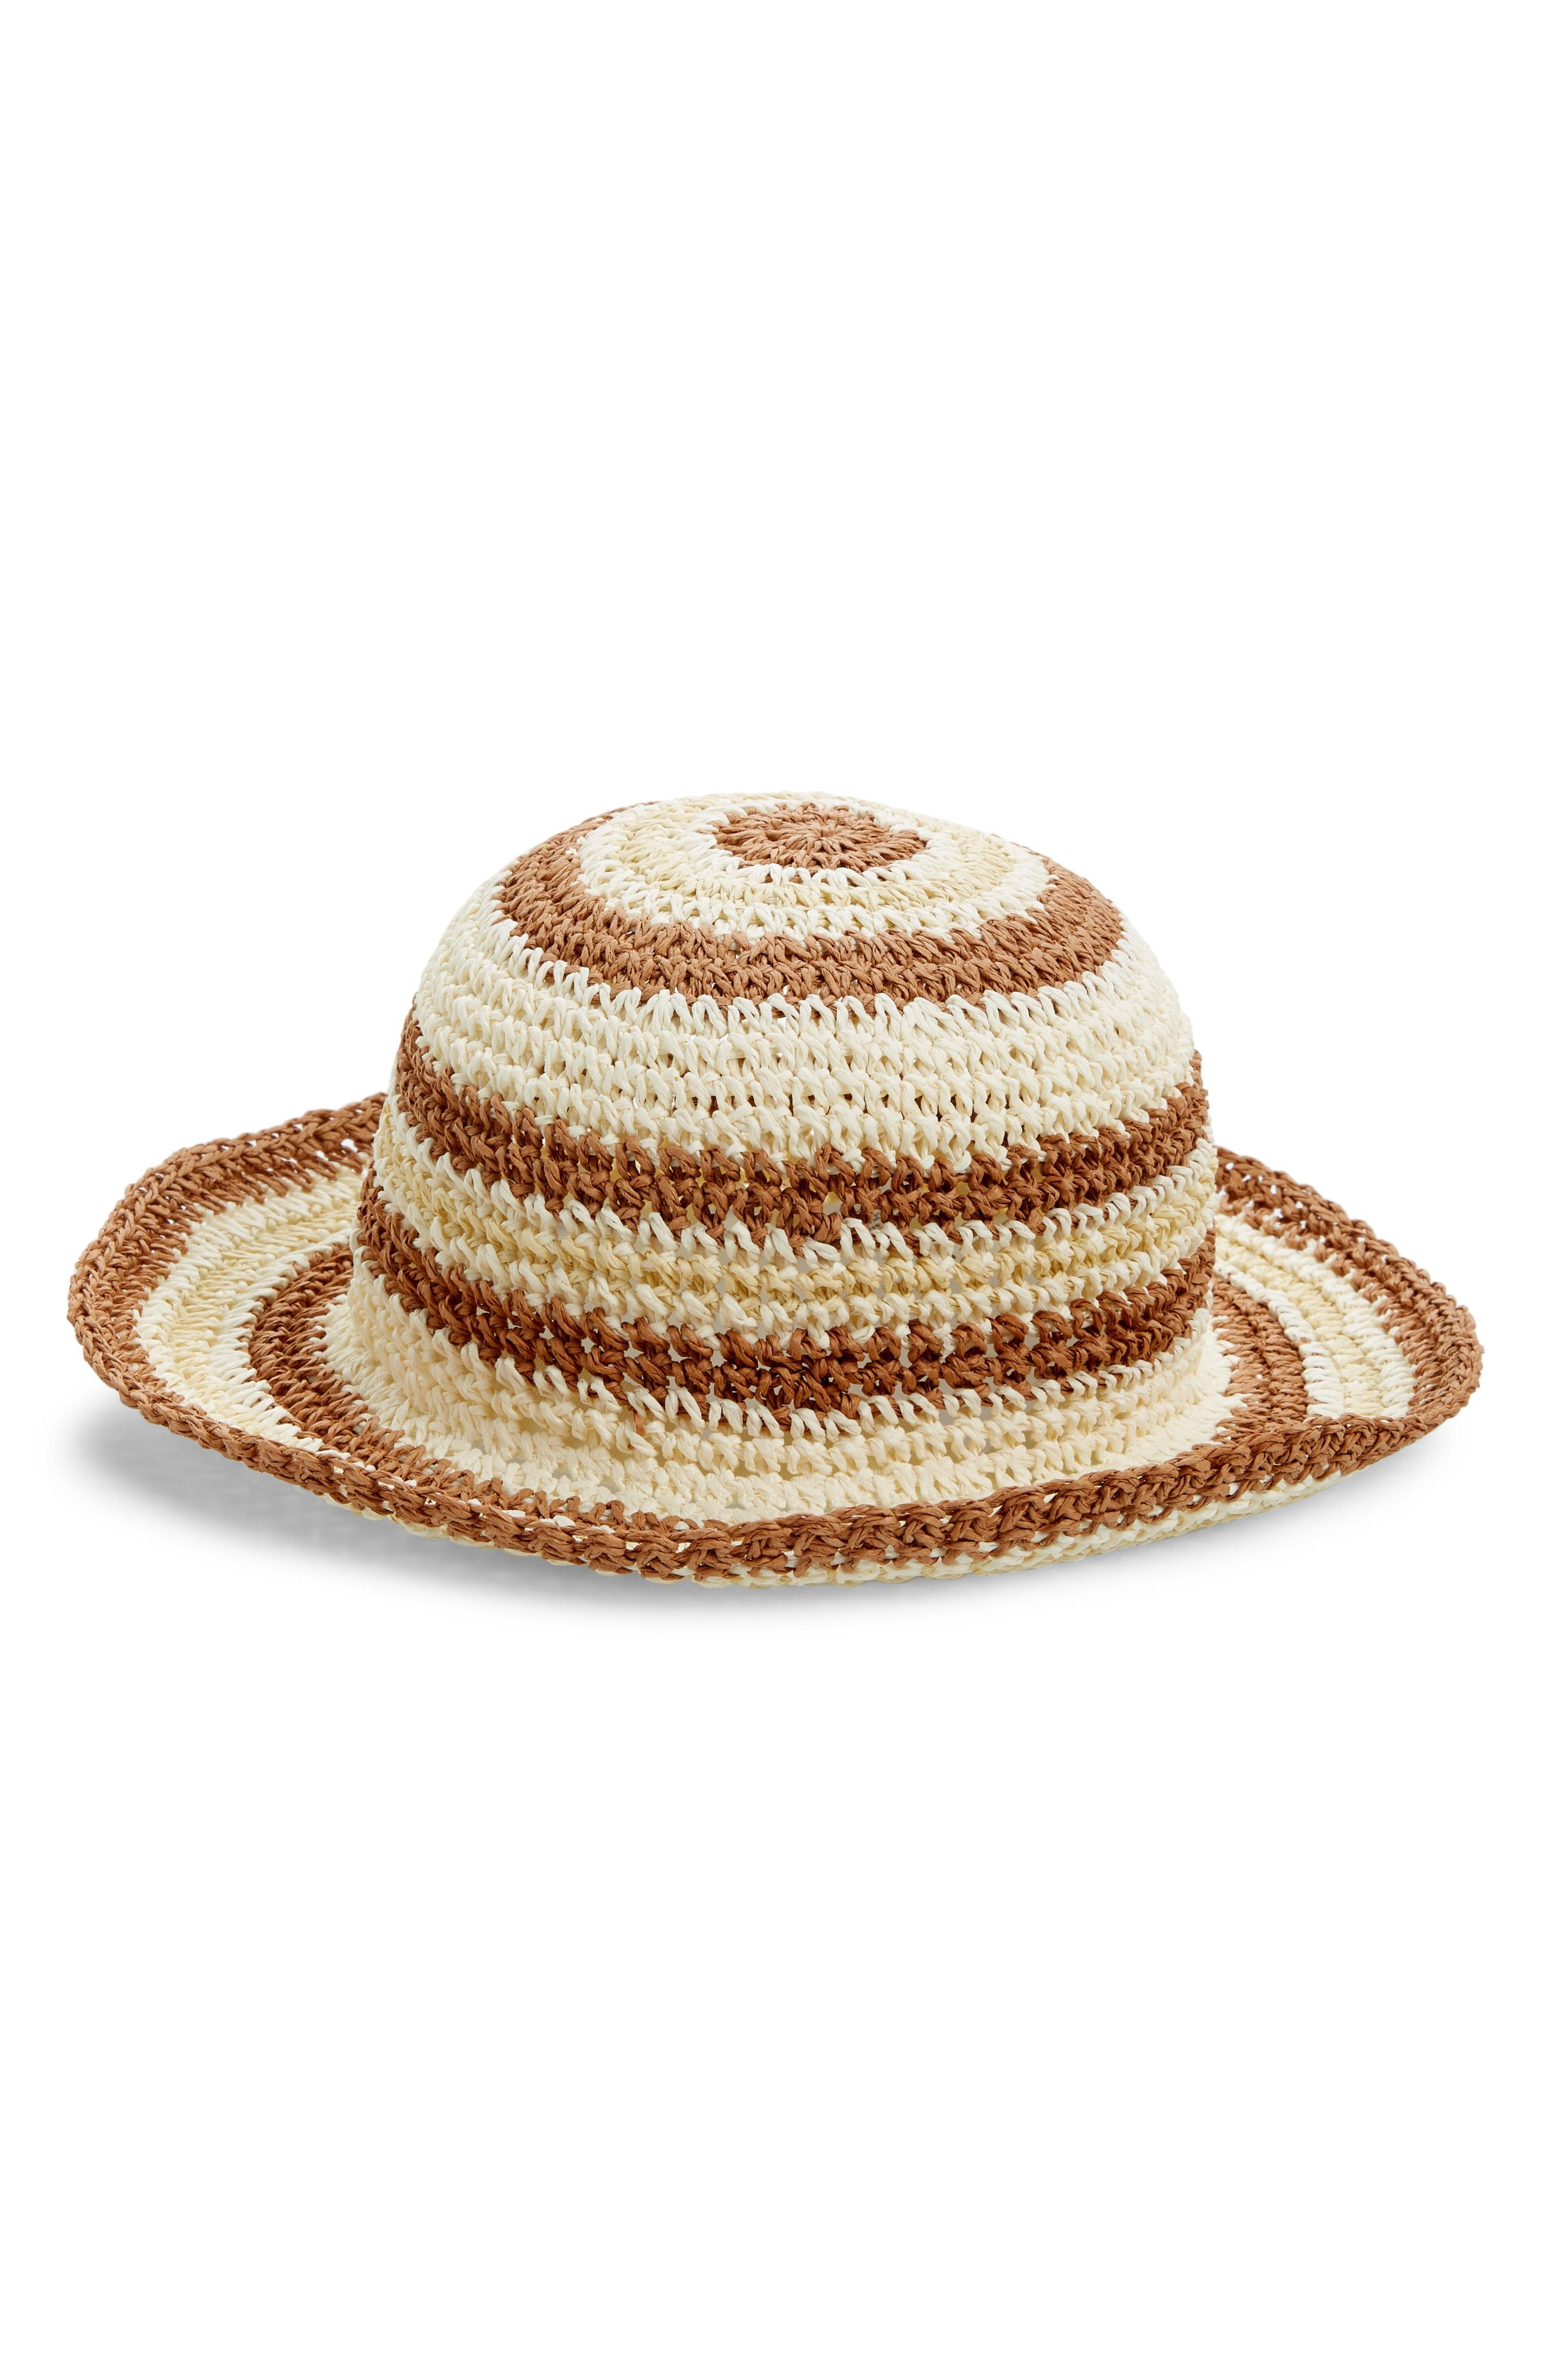 0a58edcc3be Lyst - Treasure   Bond Stripe Raffia Packable Bucket Hat in Natural